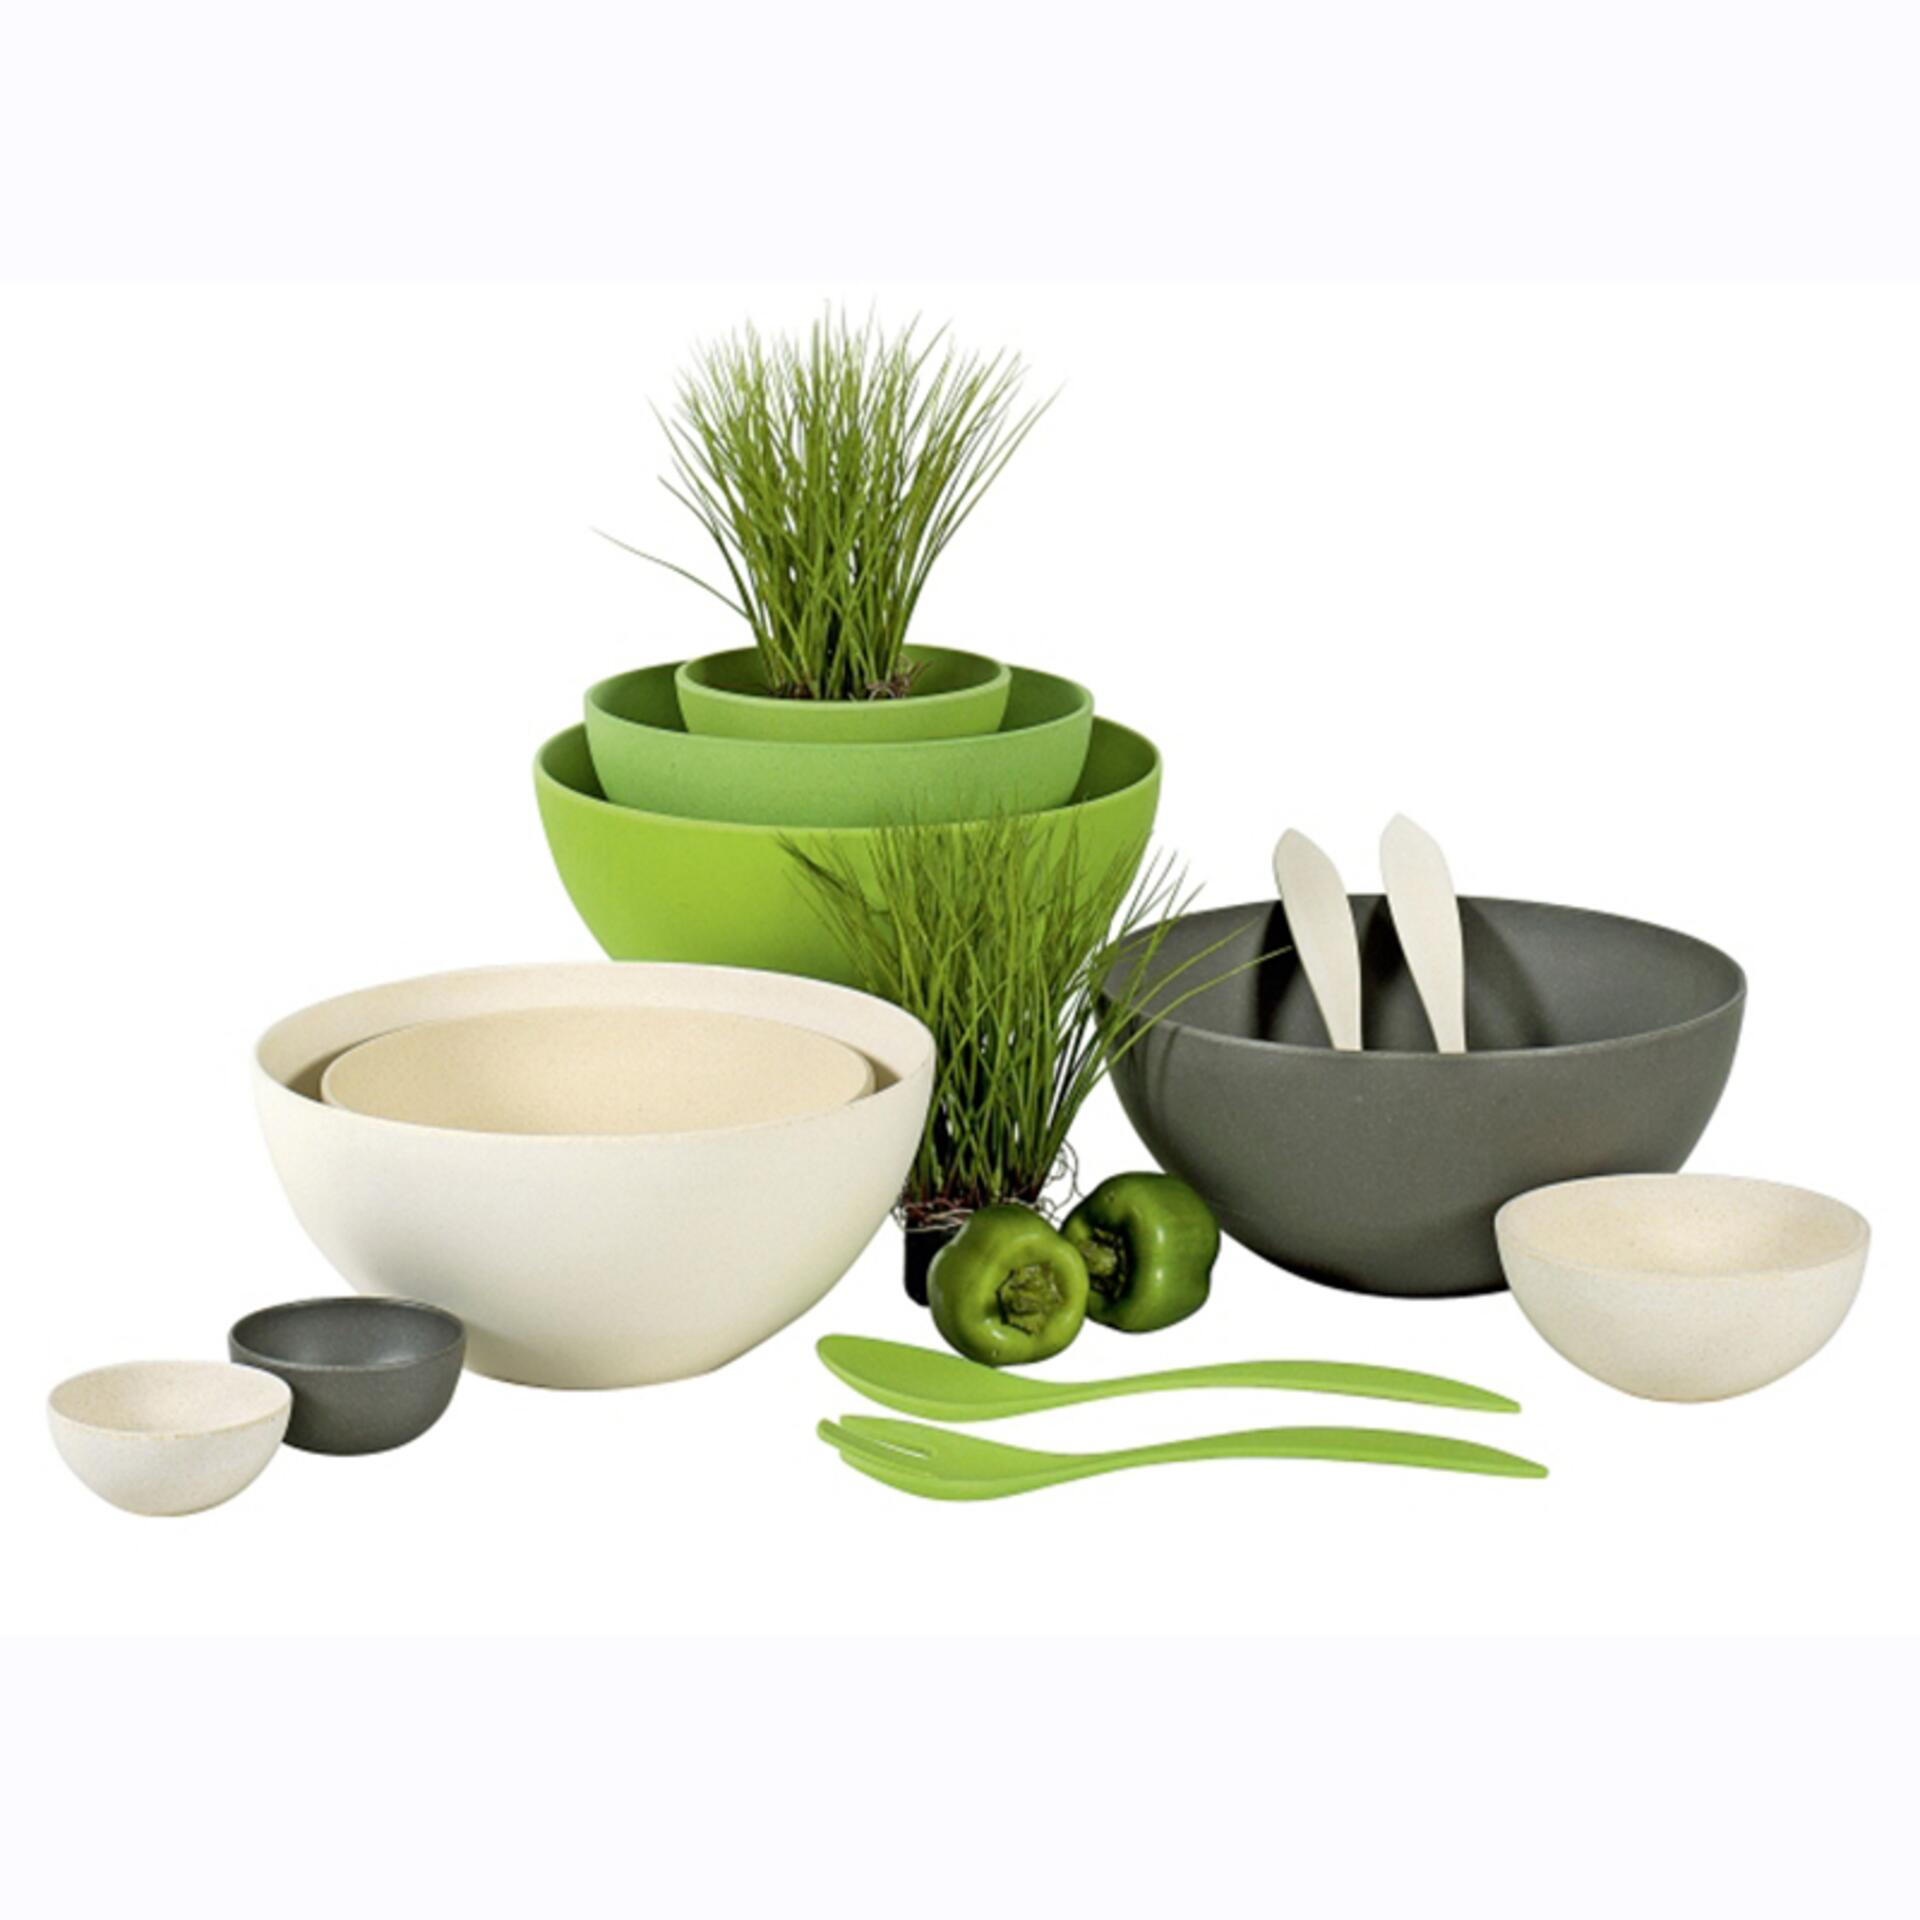 Magu Natur-Design Salatbesteck 26 cm Urban Grey